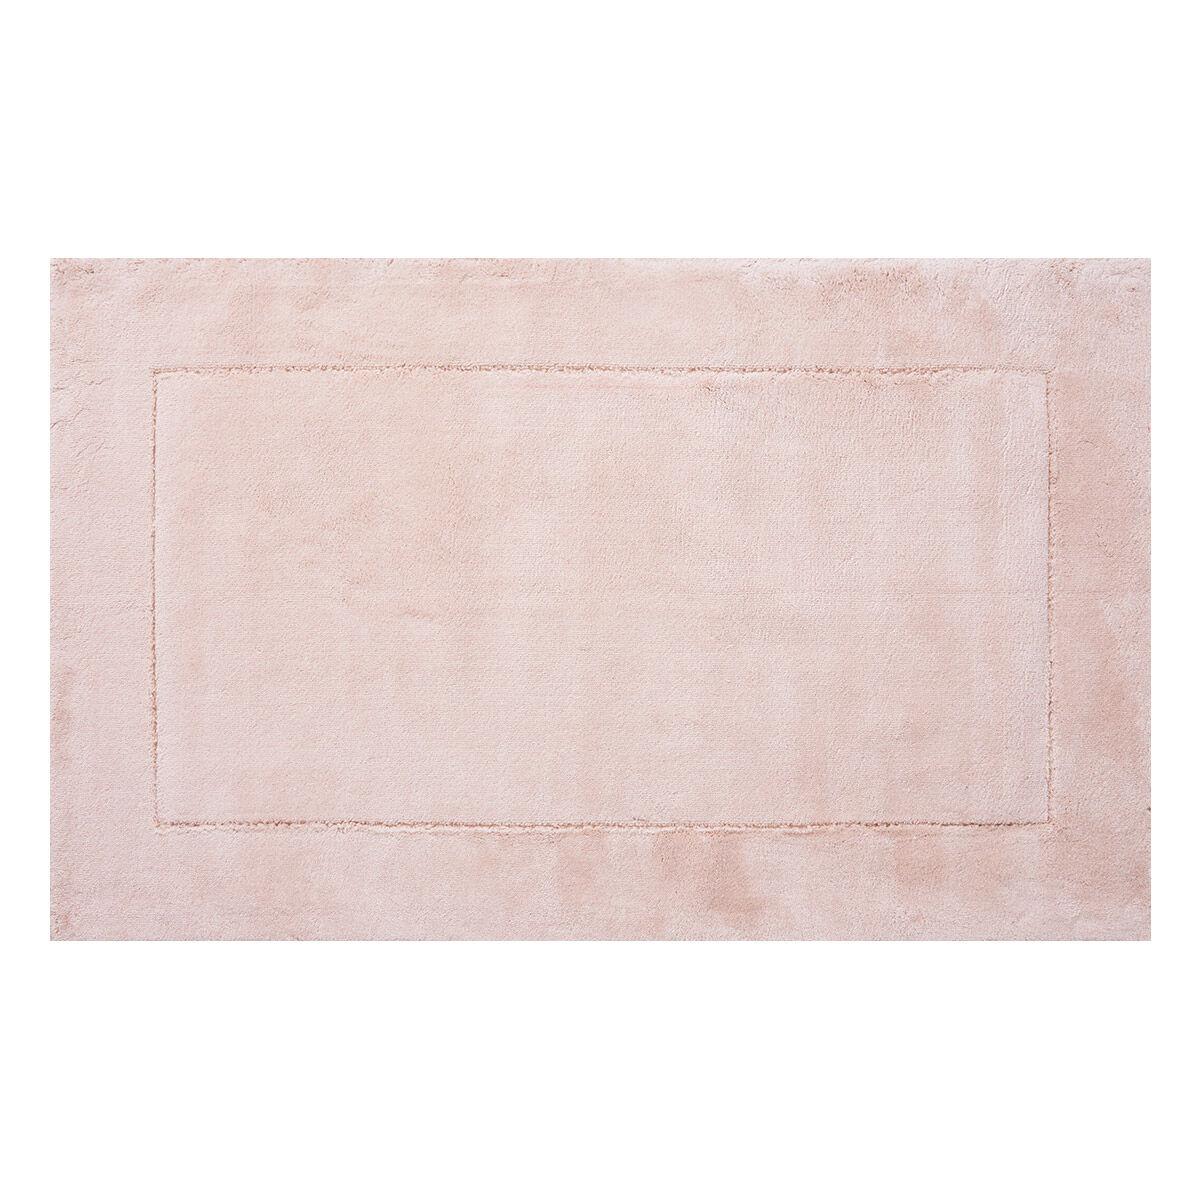 Tapis de bain rose tapis salle de bain m che rose achat for Tapis shaggy avec canape d angle black friday